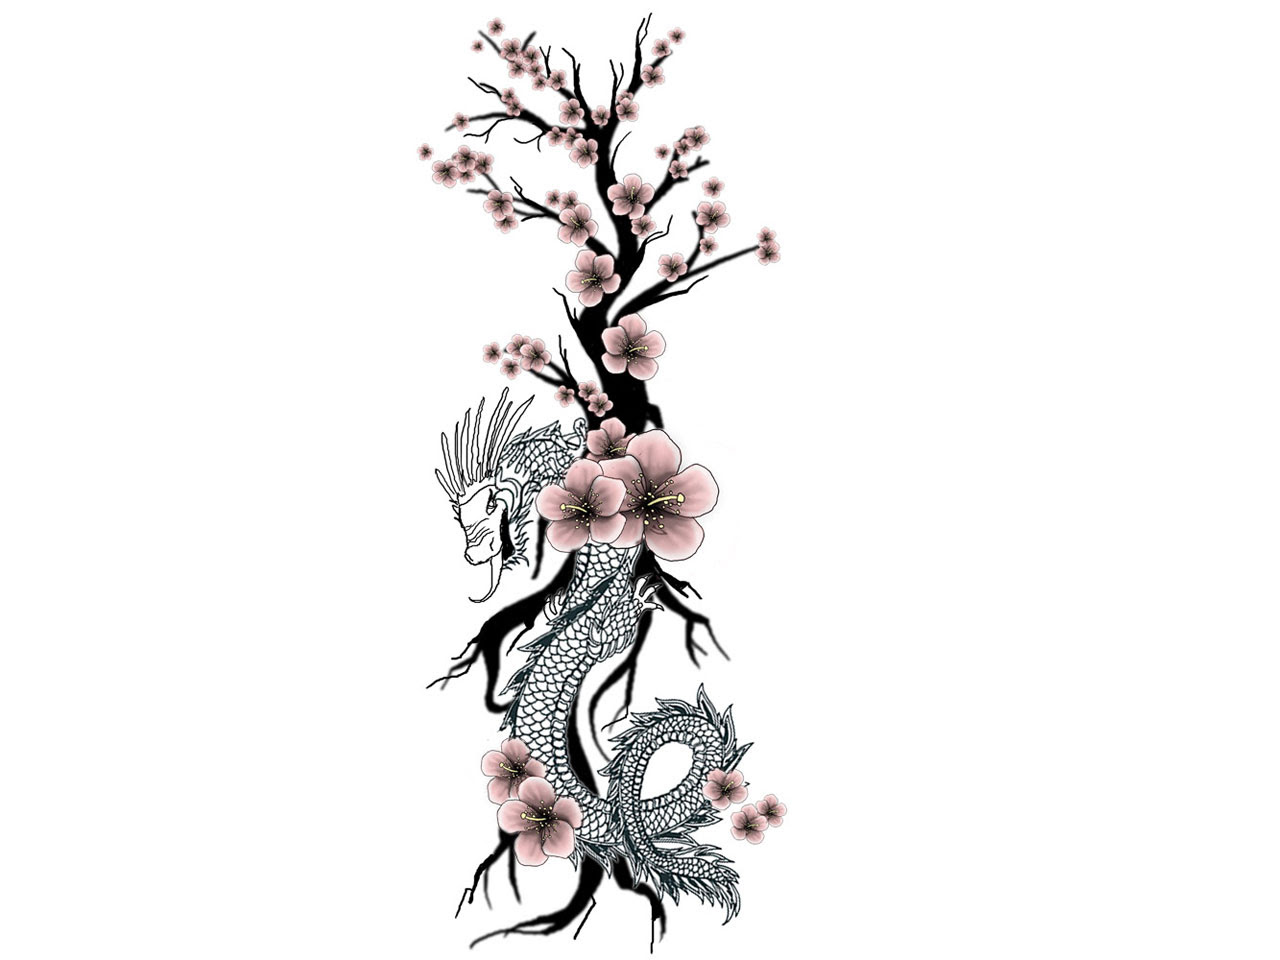 Japanese Dragon And Cherry Blossom Tattoo Design